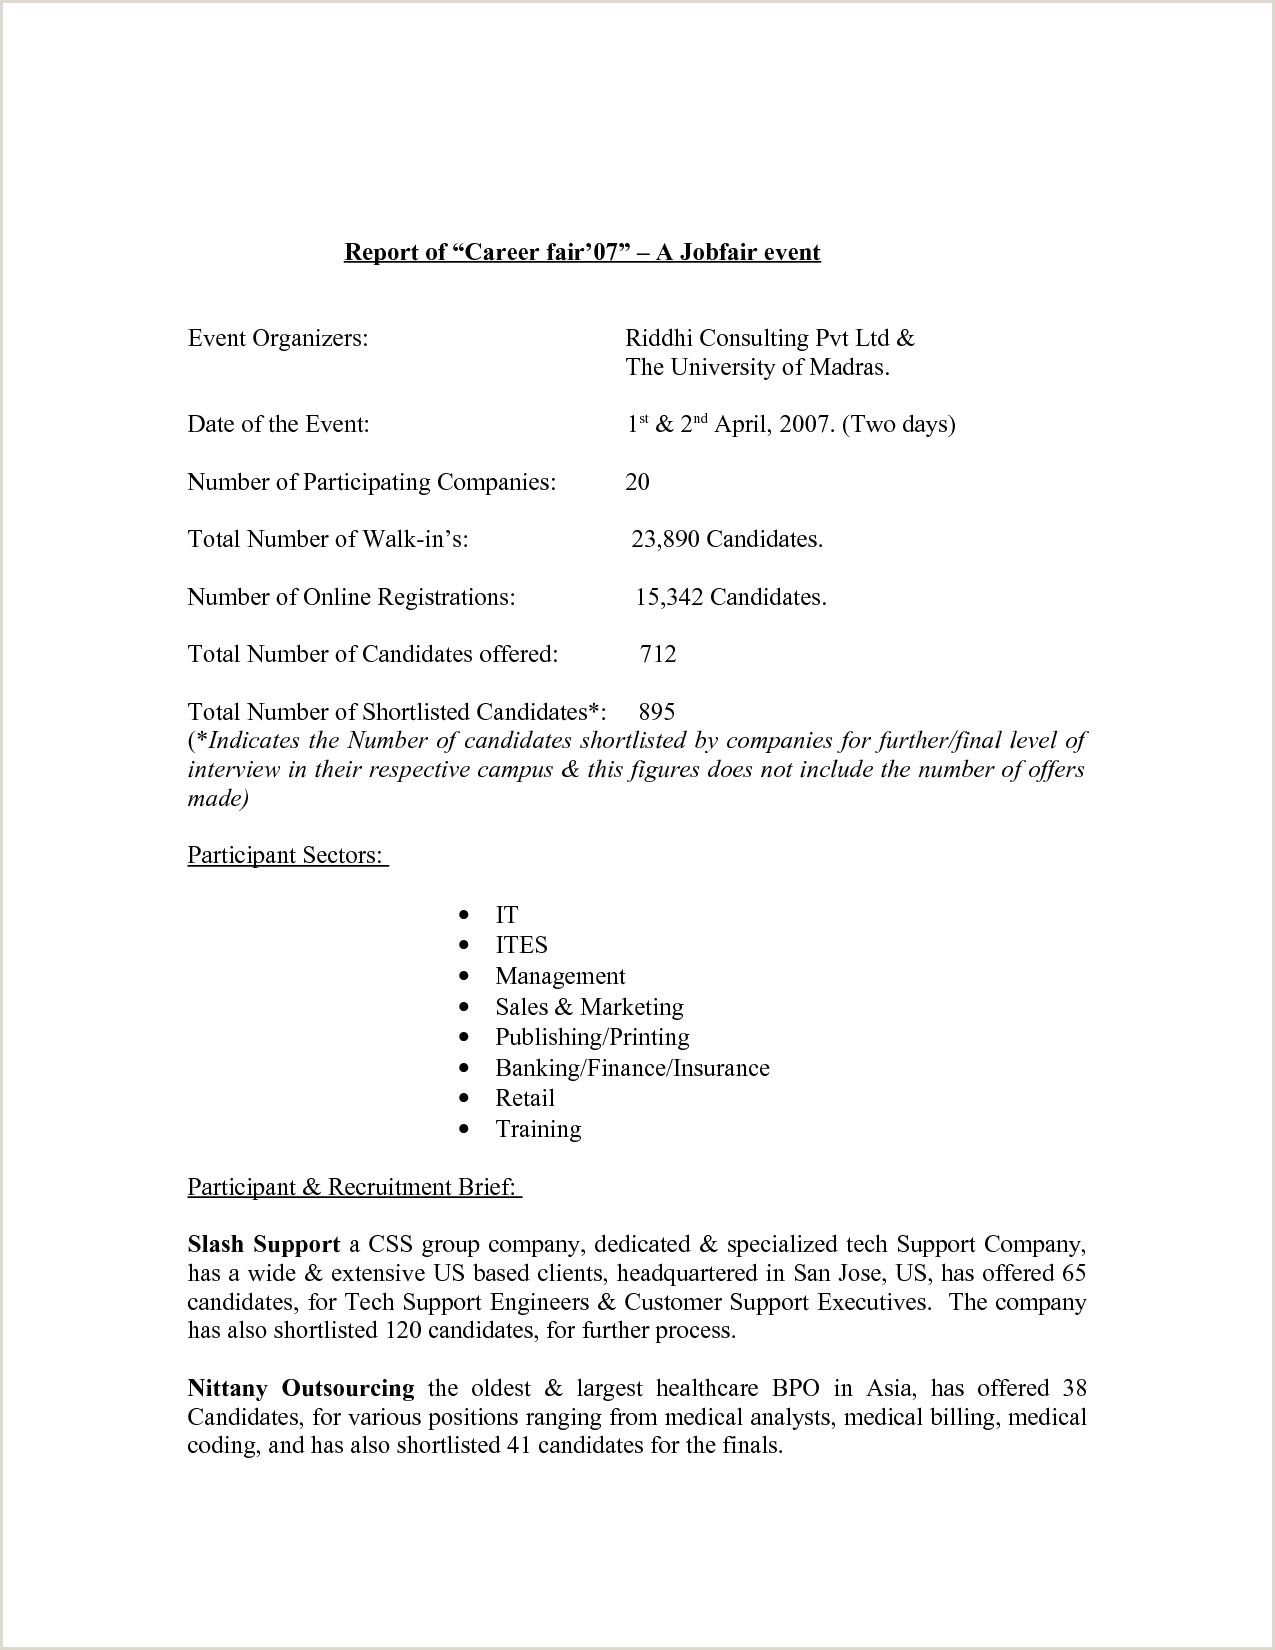 Fresher Cv Format Free Download Sample Resume For Freshers B Graduate Pdf New Resume